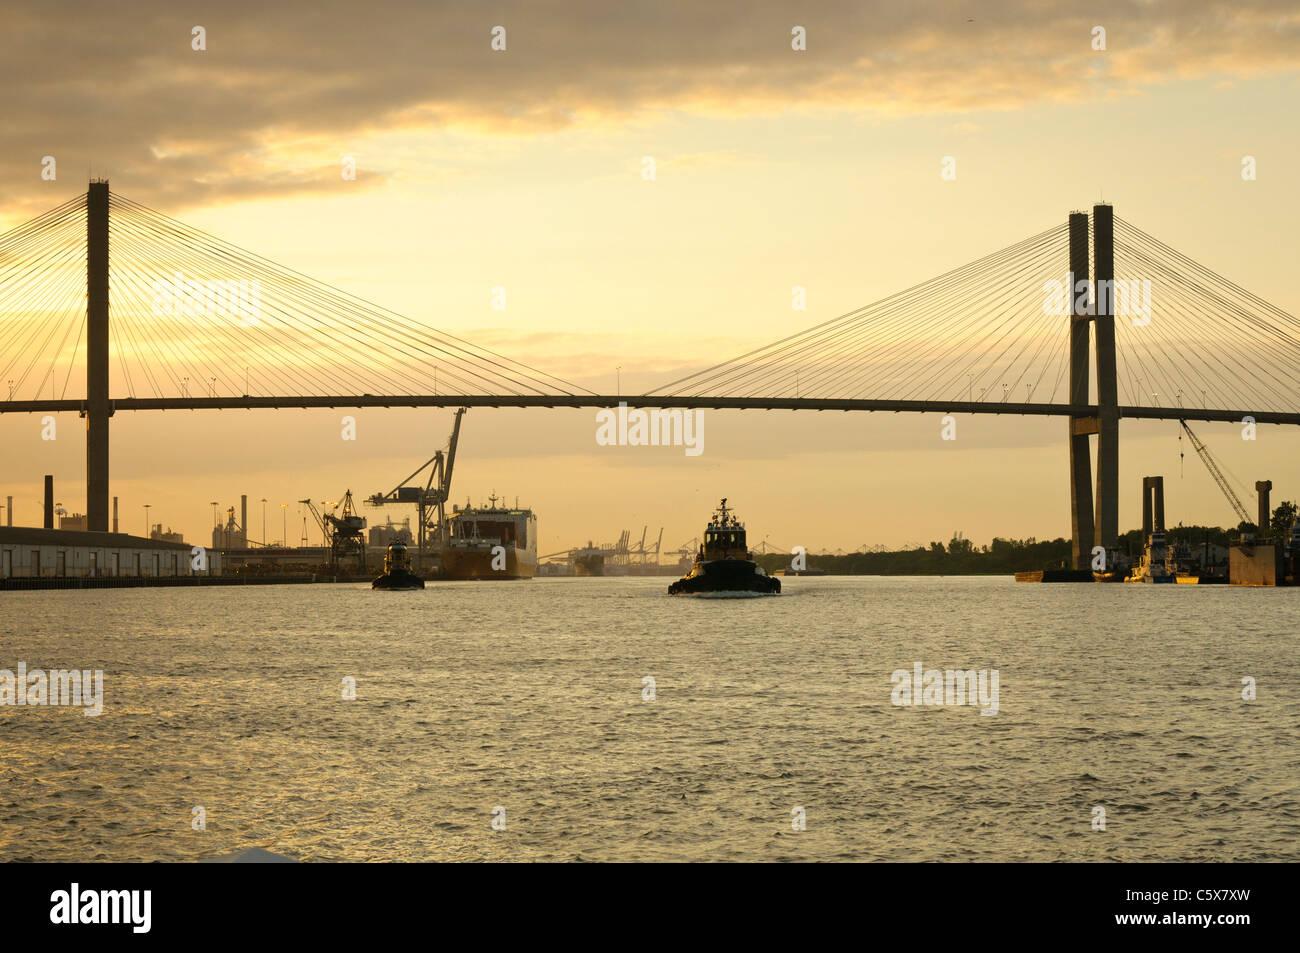 A tug boat passes under the Talmadge Memorial Bridge in Savannah, Georgia at sunset. - Stock Image